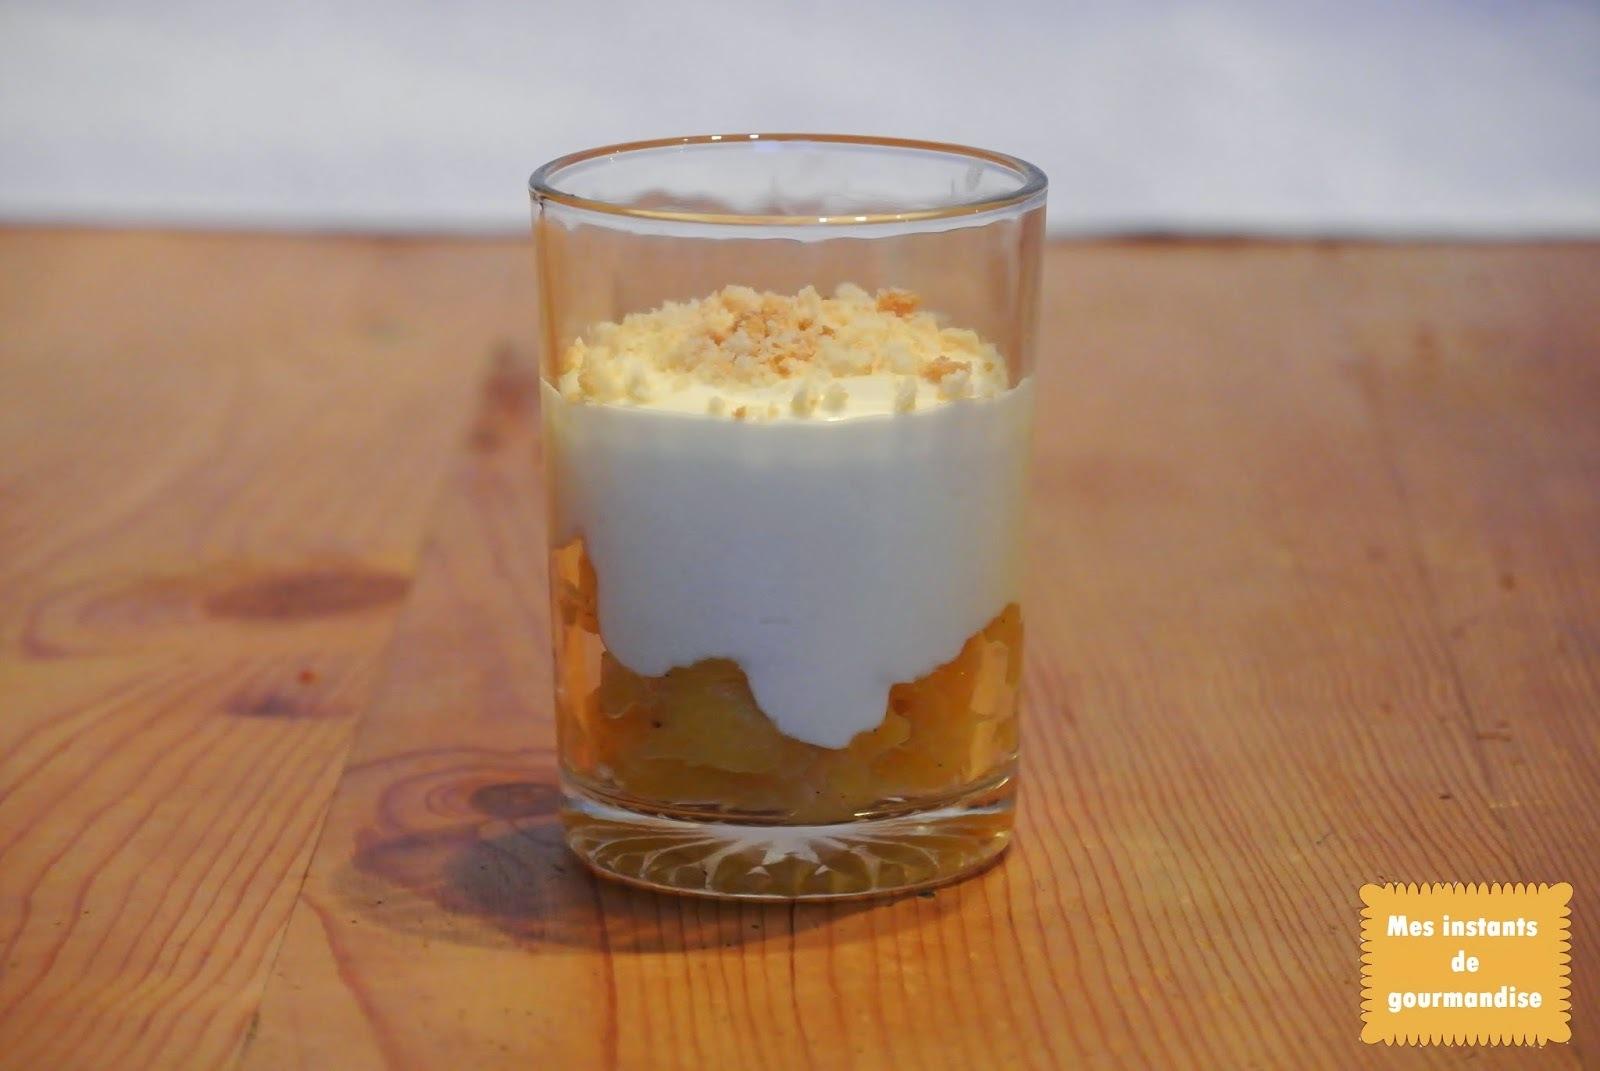 Cheesecake à l'ananas façon Cyril Lignac